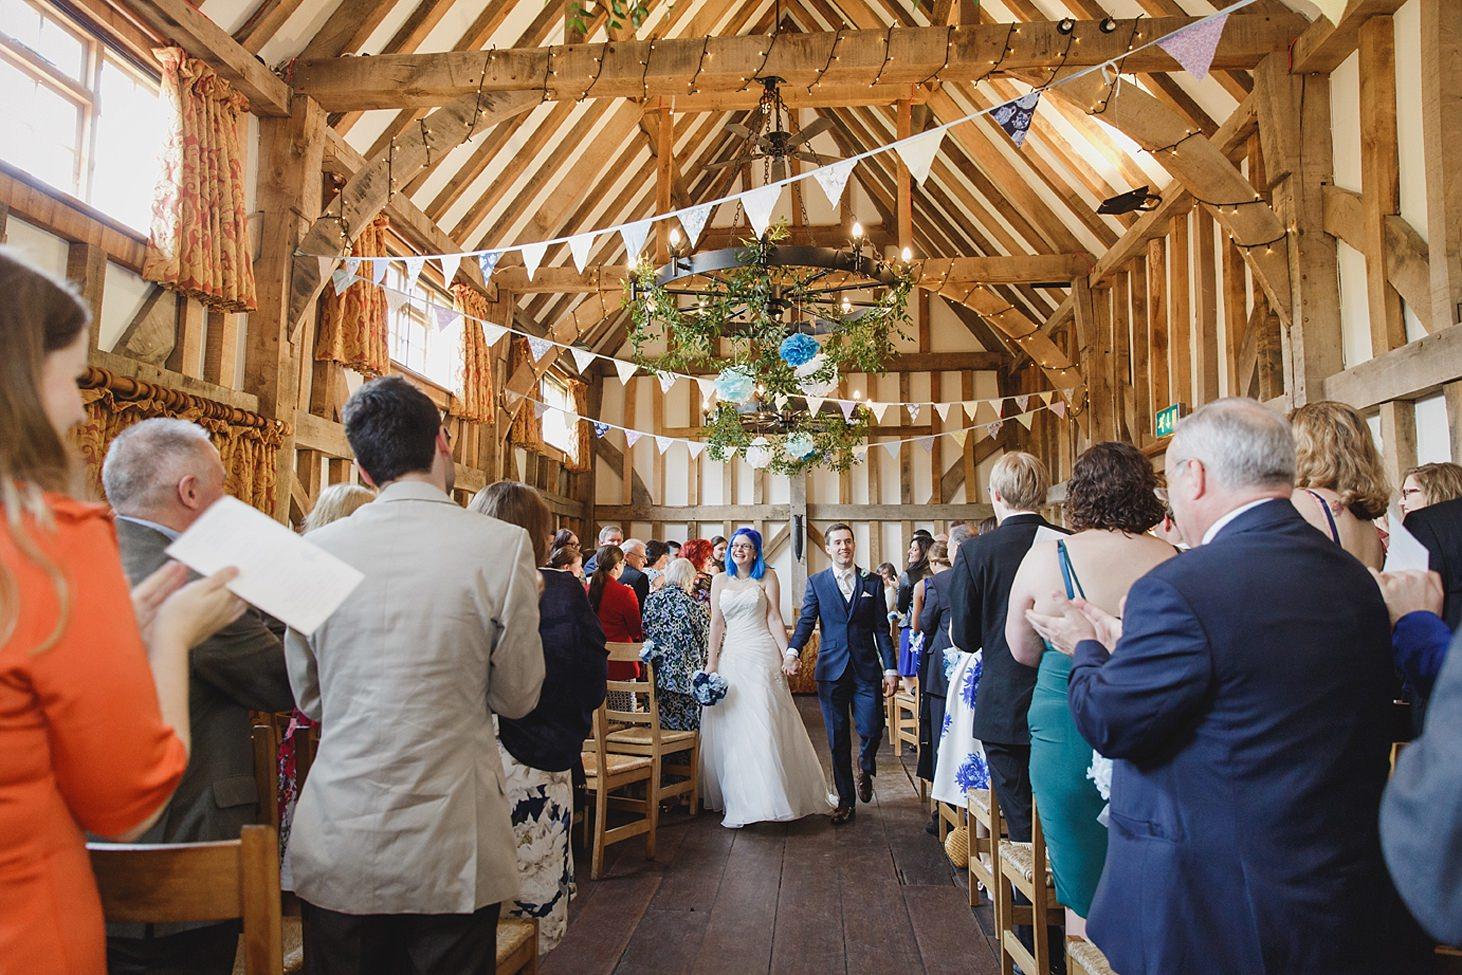 gate street barn wedding photography bride and groom walk down aisle